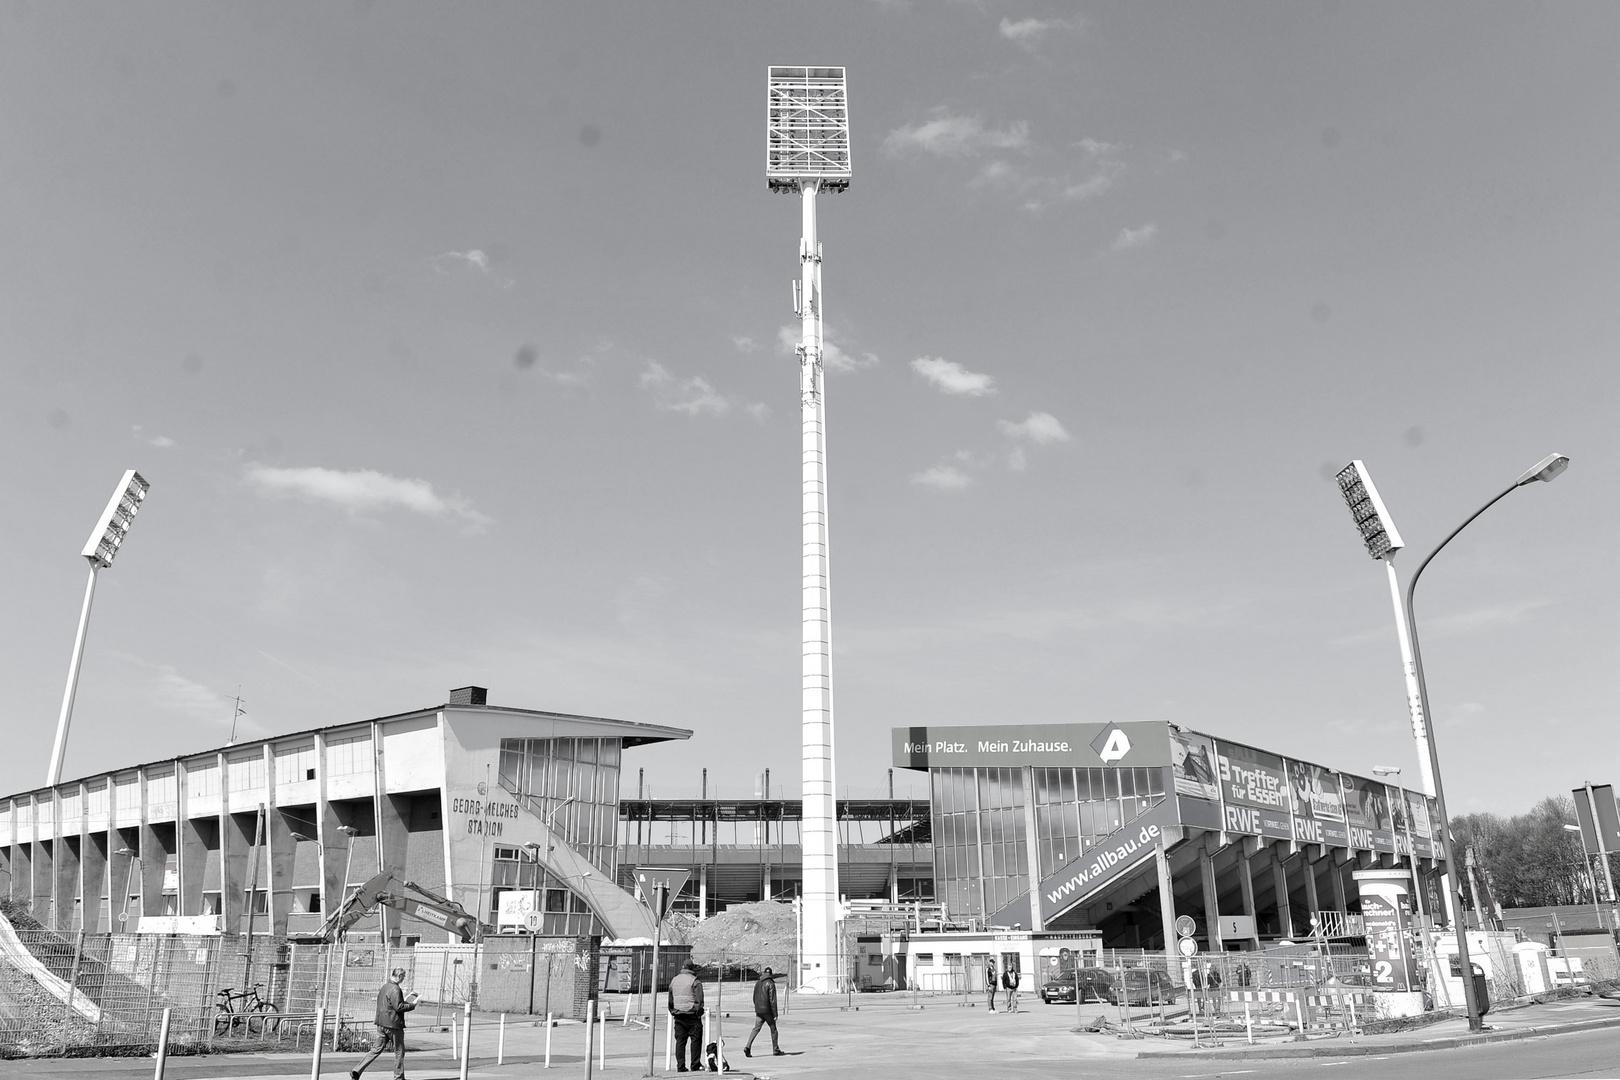 Georg-Melches Stadion